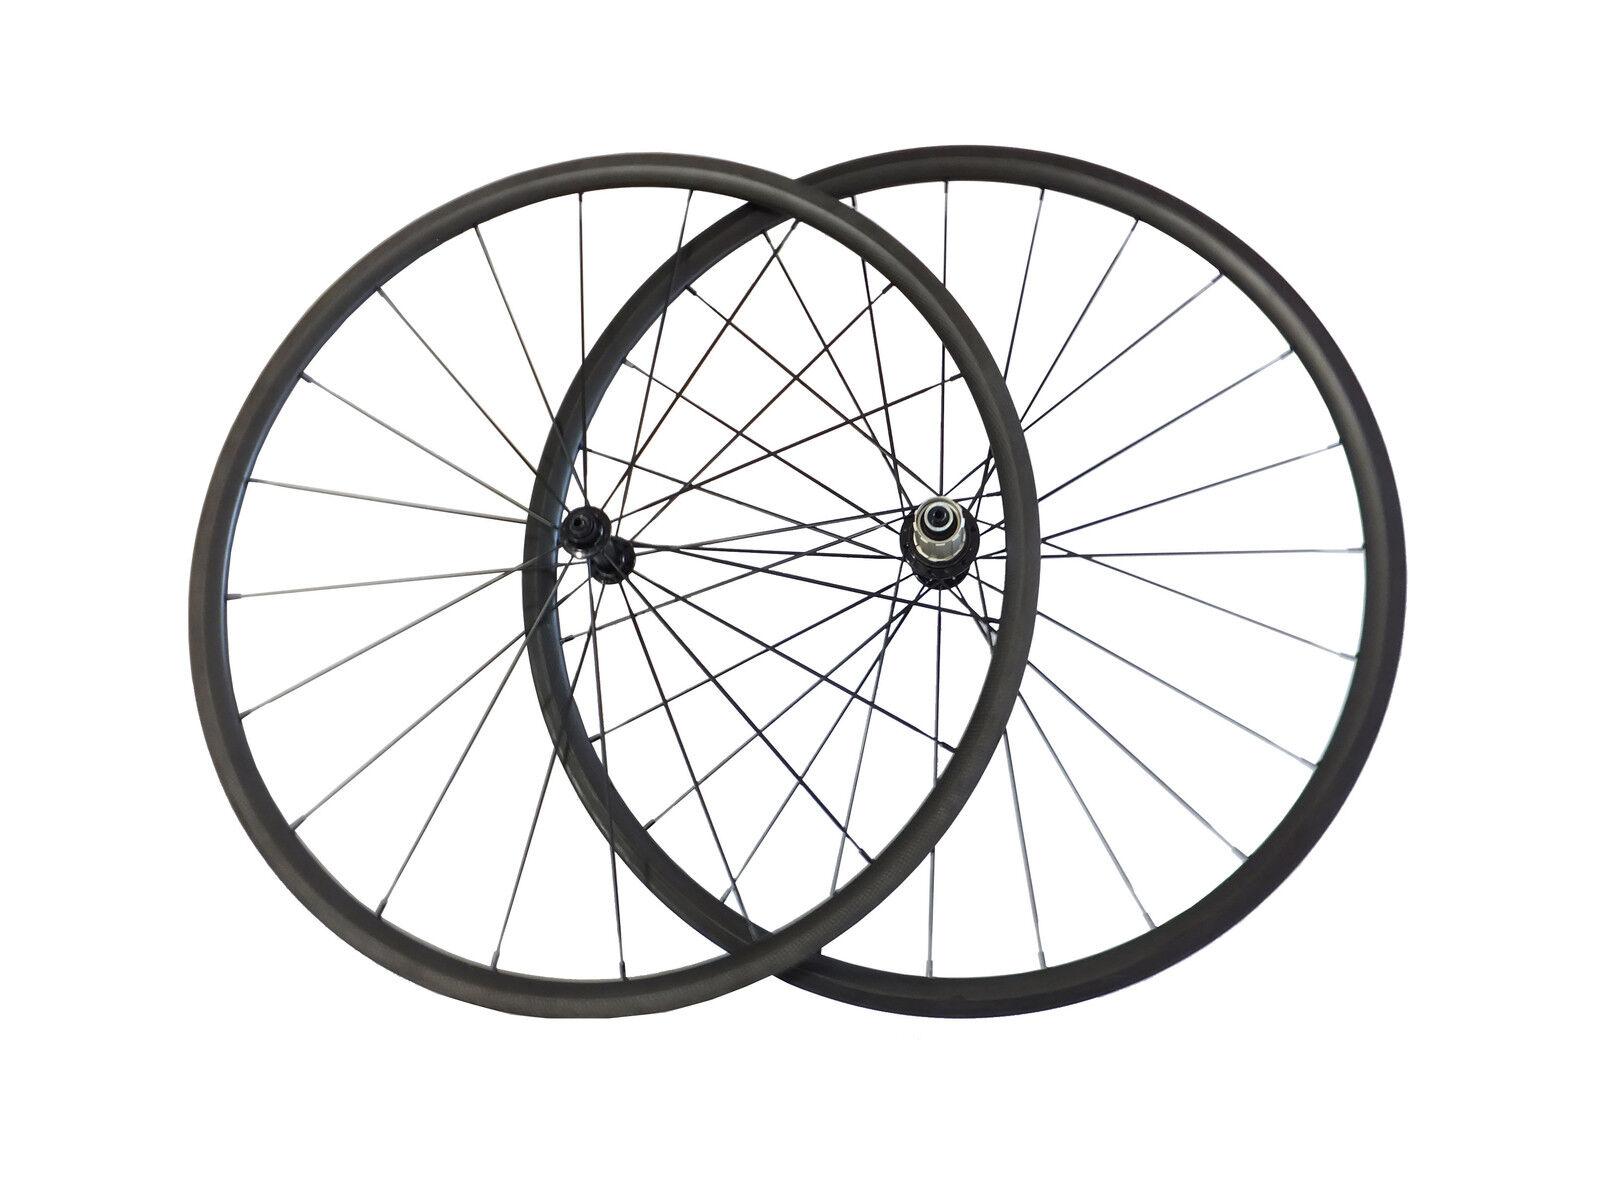 24mm Clincher Carbon Road Bike Bicycle Wheels 700C Carbon Wheels 23mm width